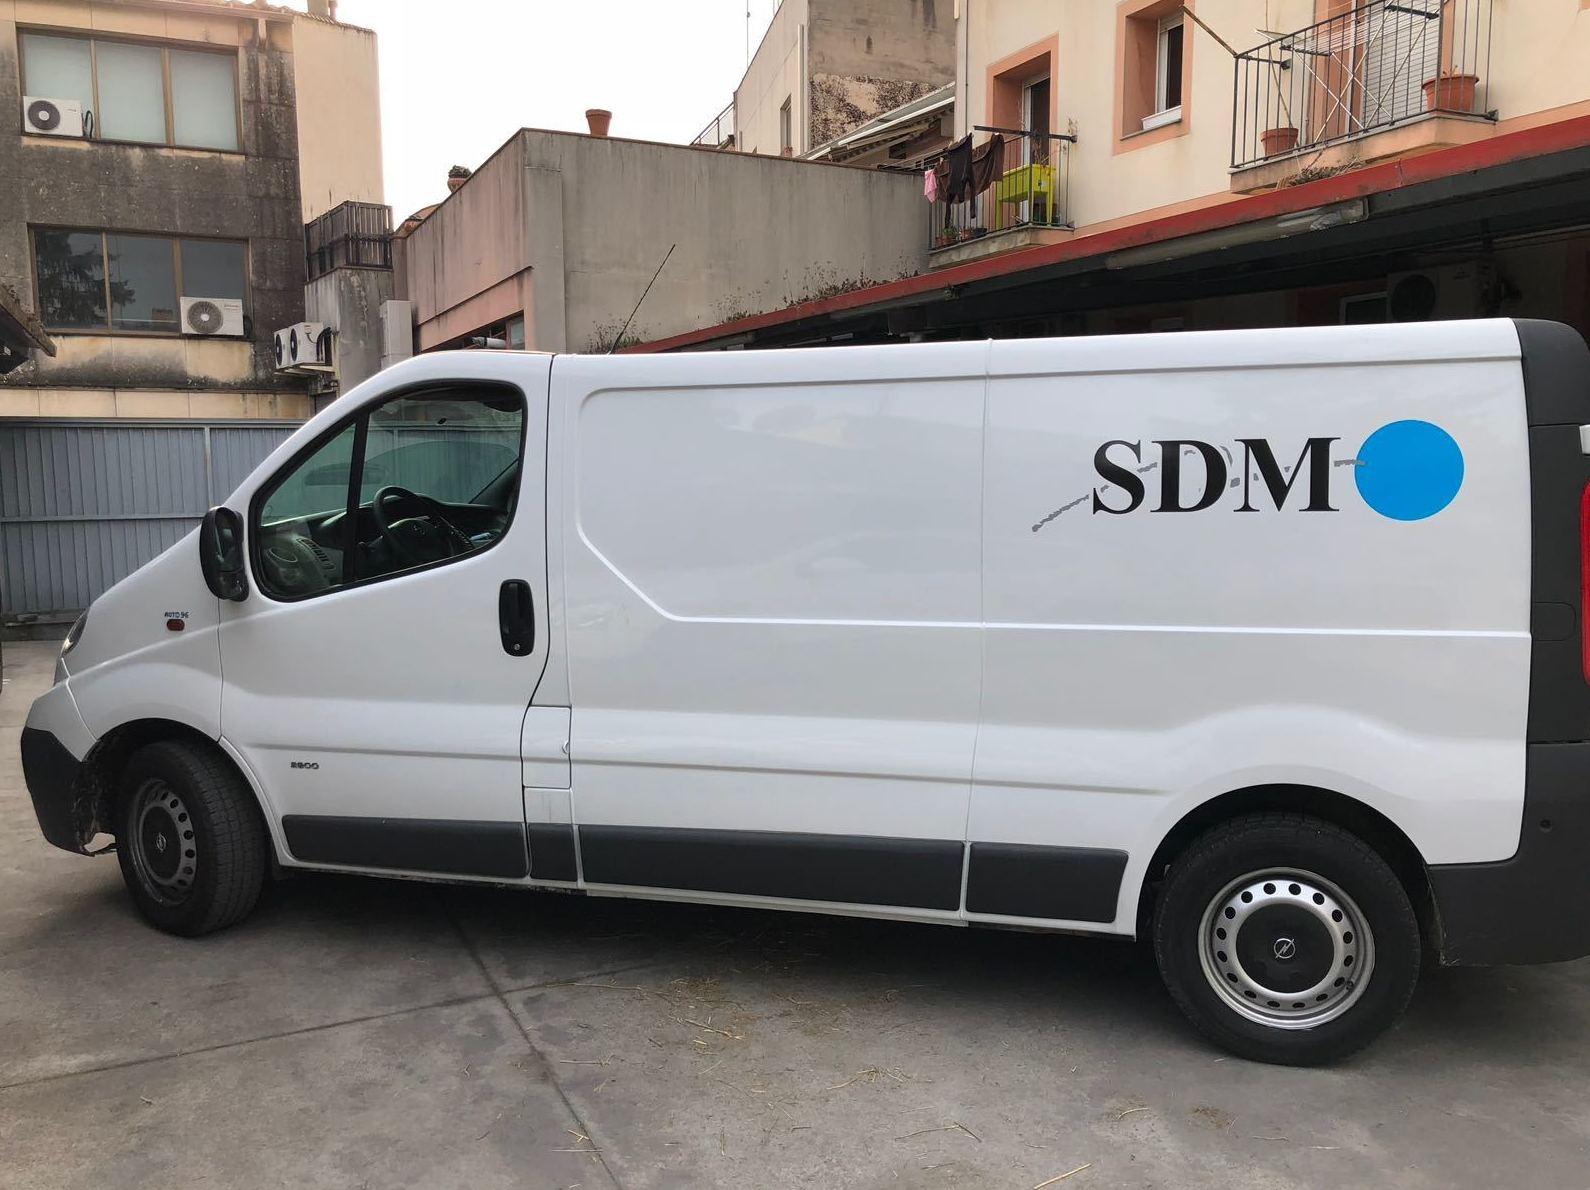 Foto 8 de Mensajería en Sant Celoni | Illa Transports